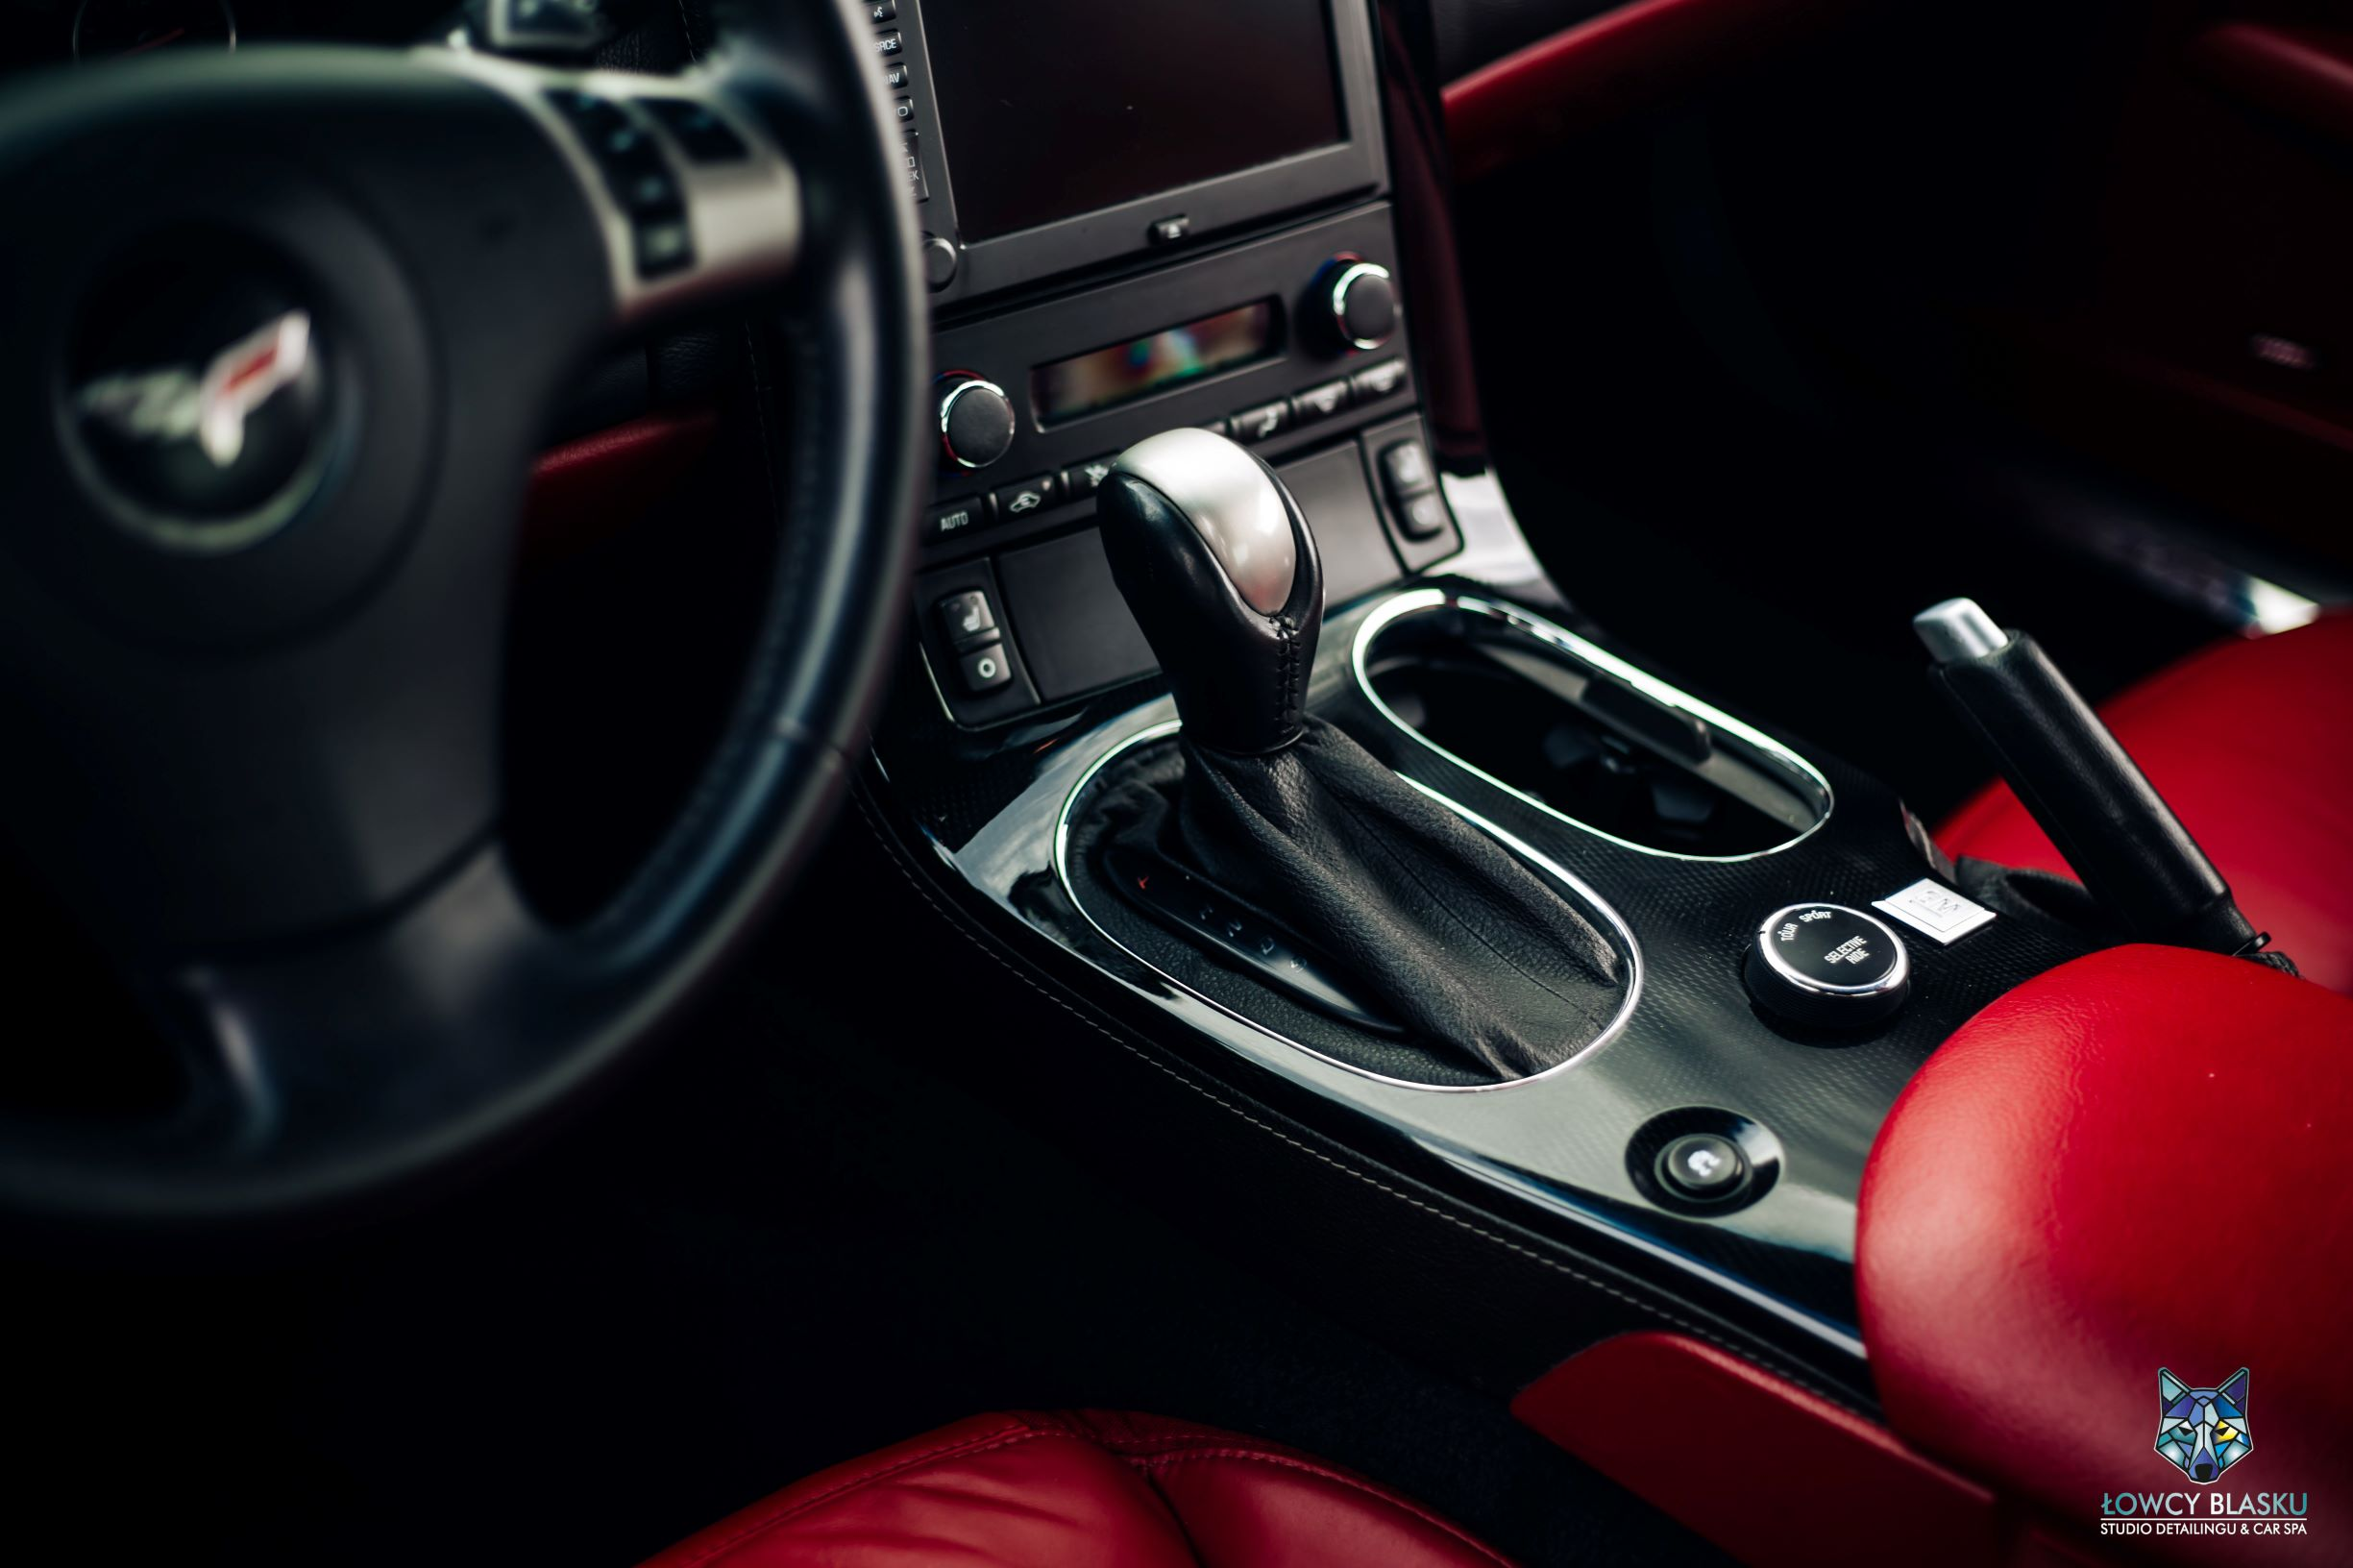 Chevrolet Corvette-pełny detailing wnętrza